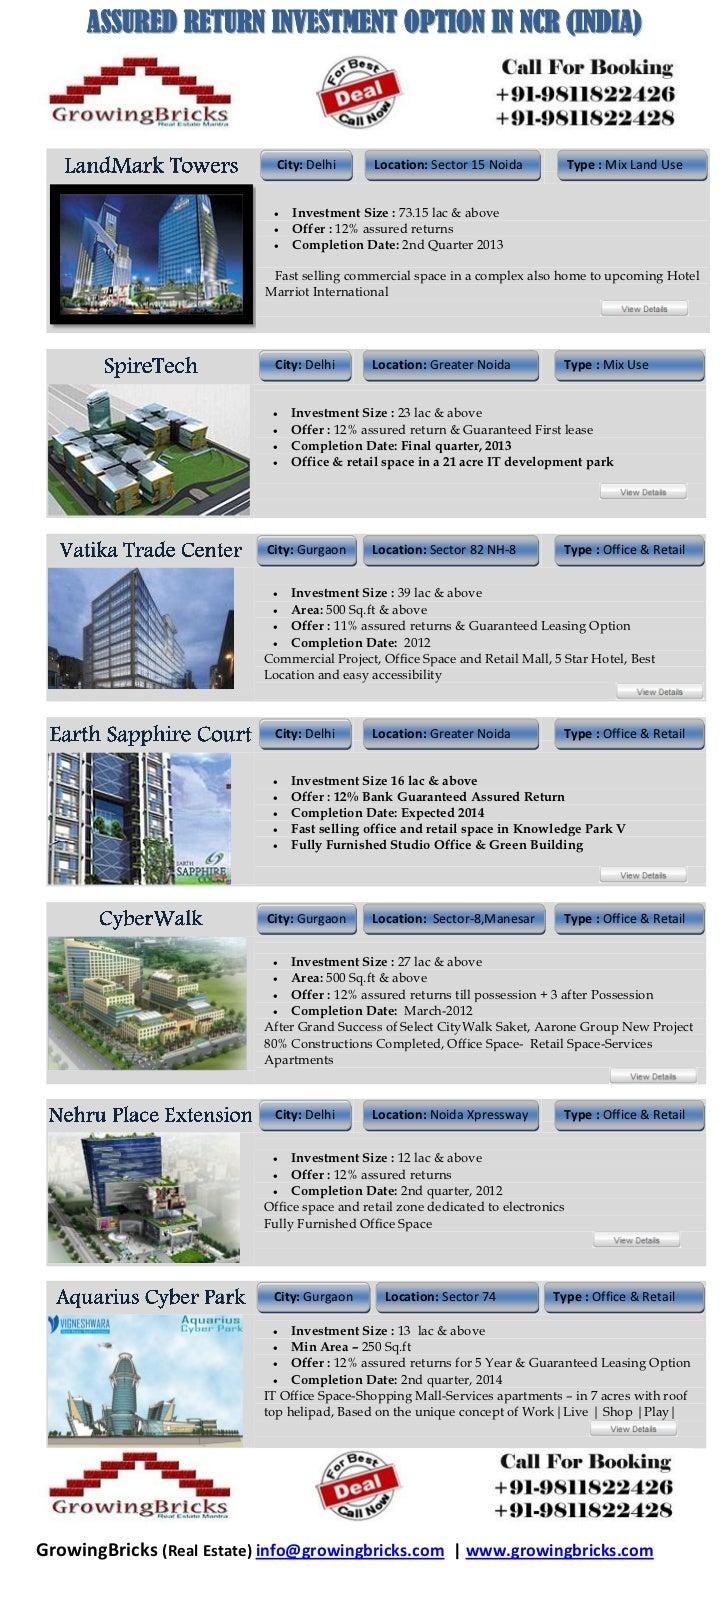 Assured Return Project in Greater Noida ||Call 09811822426|| Assured Return Project in Noida | Assured Return |Commercial | Office Space | Builder| Assured Return Property | Gurgaon | Noida | Delhi | Return Assured | India | Assured Return Properties | In